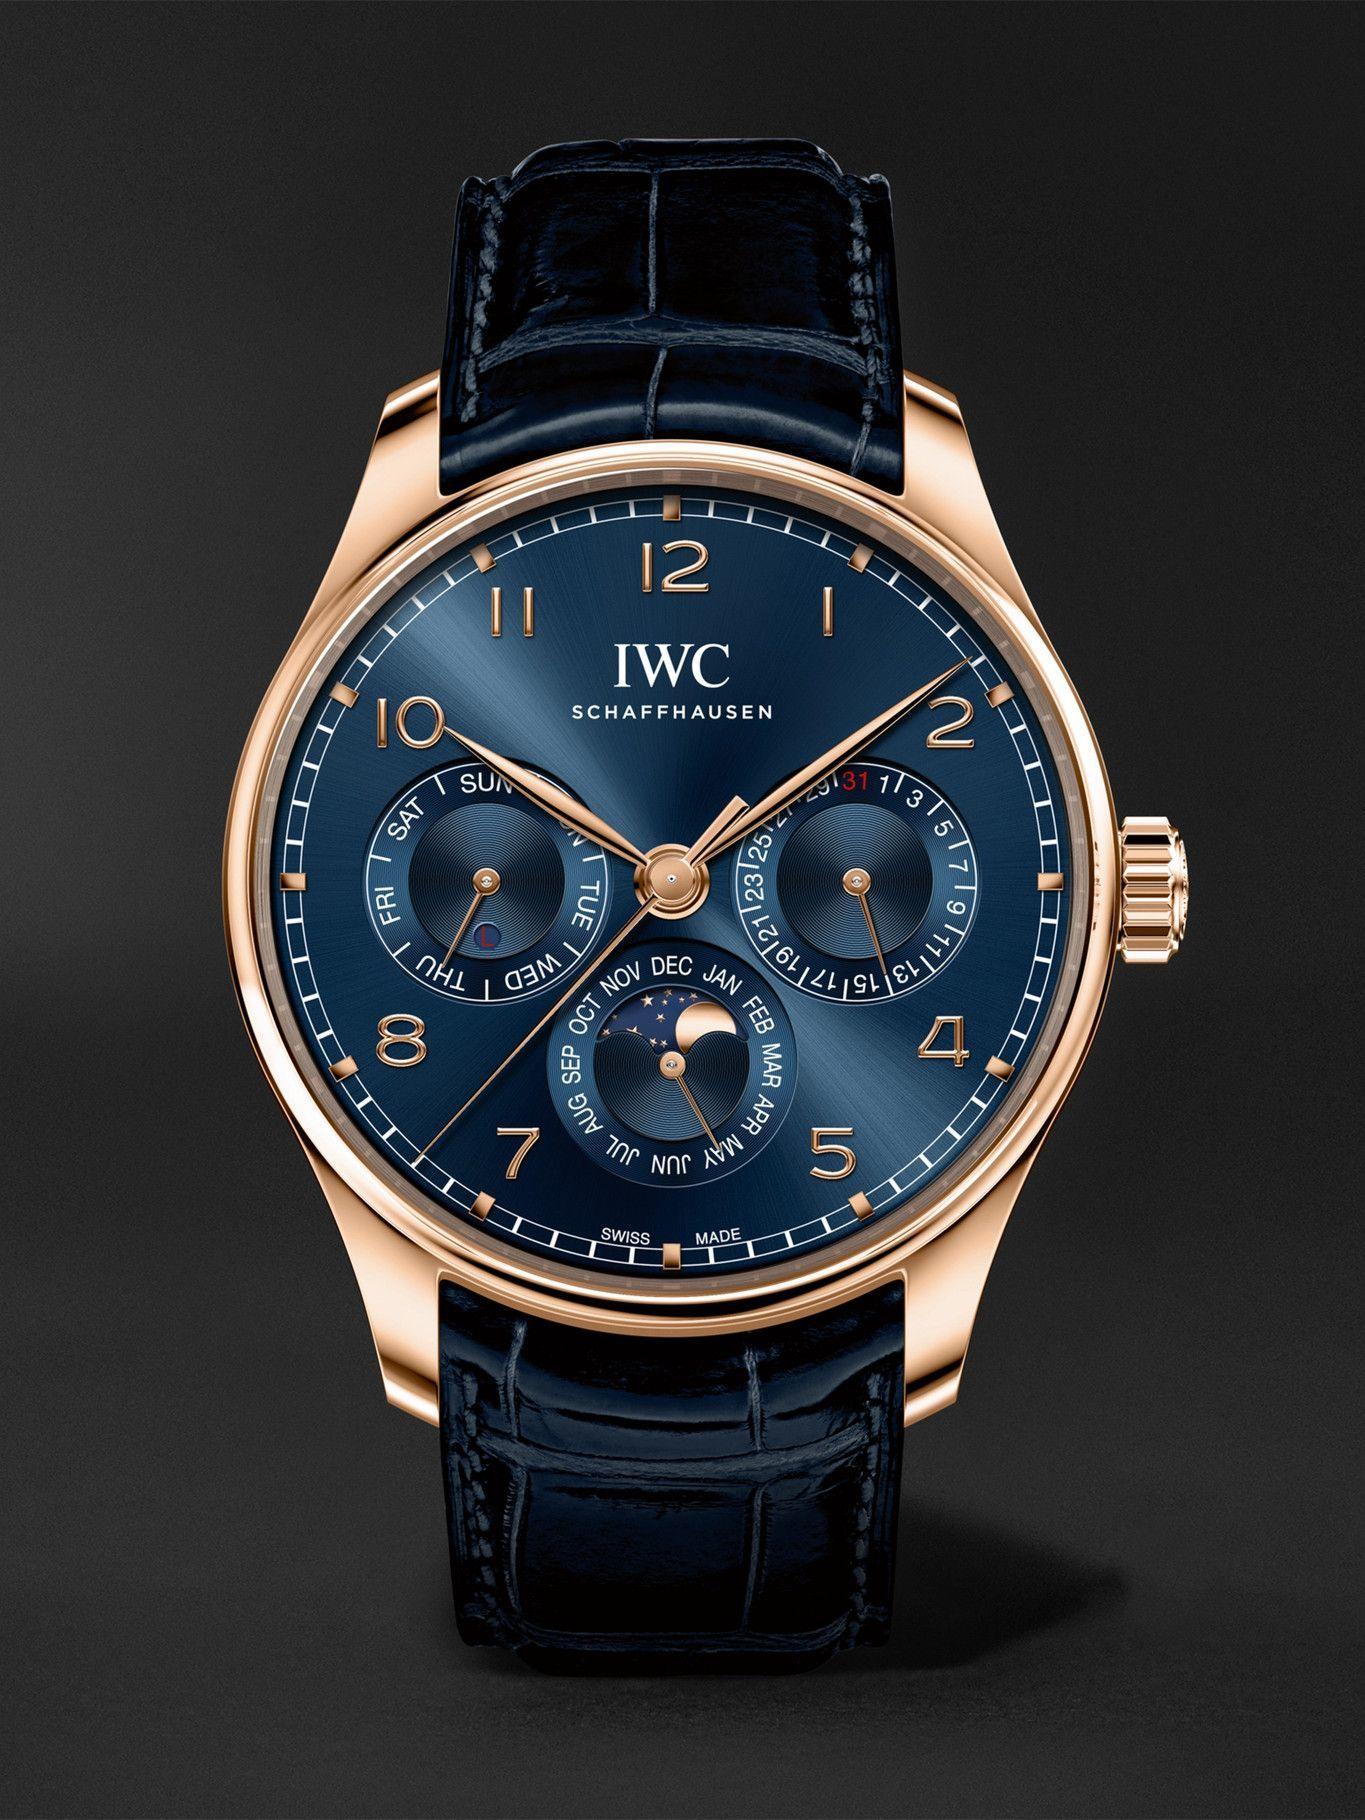 Photo: IWC Schaffhausen - Portugieser Perpetual Calendar Boutique Edition Automatic 42.4mm 18-Karat Red Gold and Alligator Watch, Ref. No. IW344205